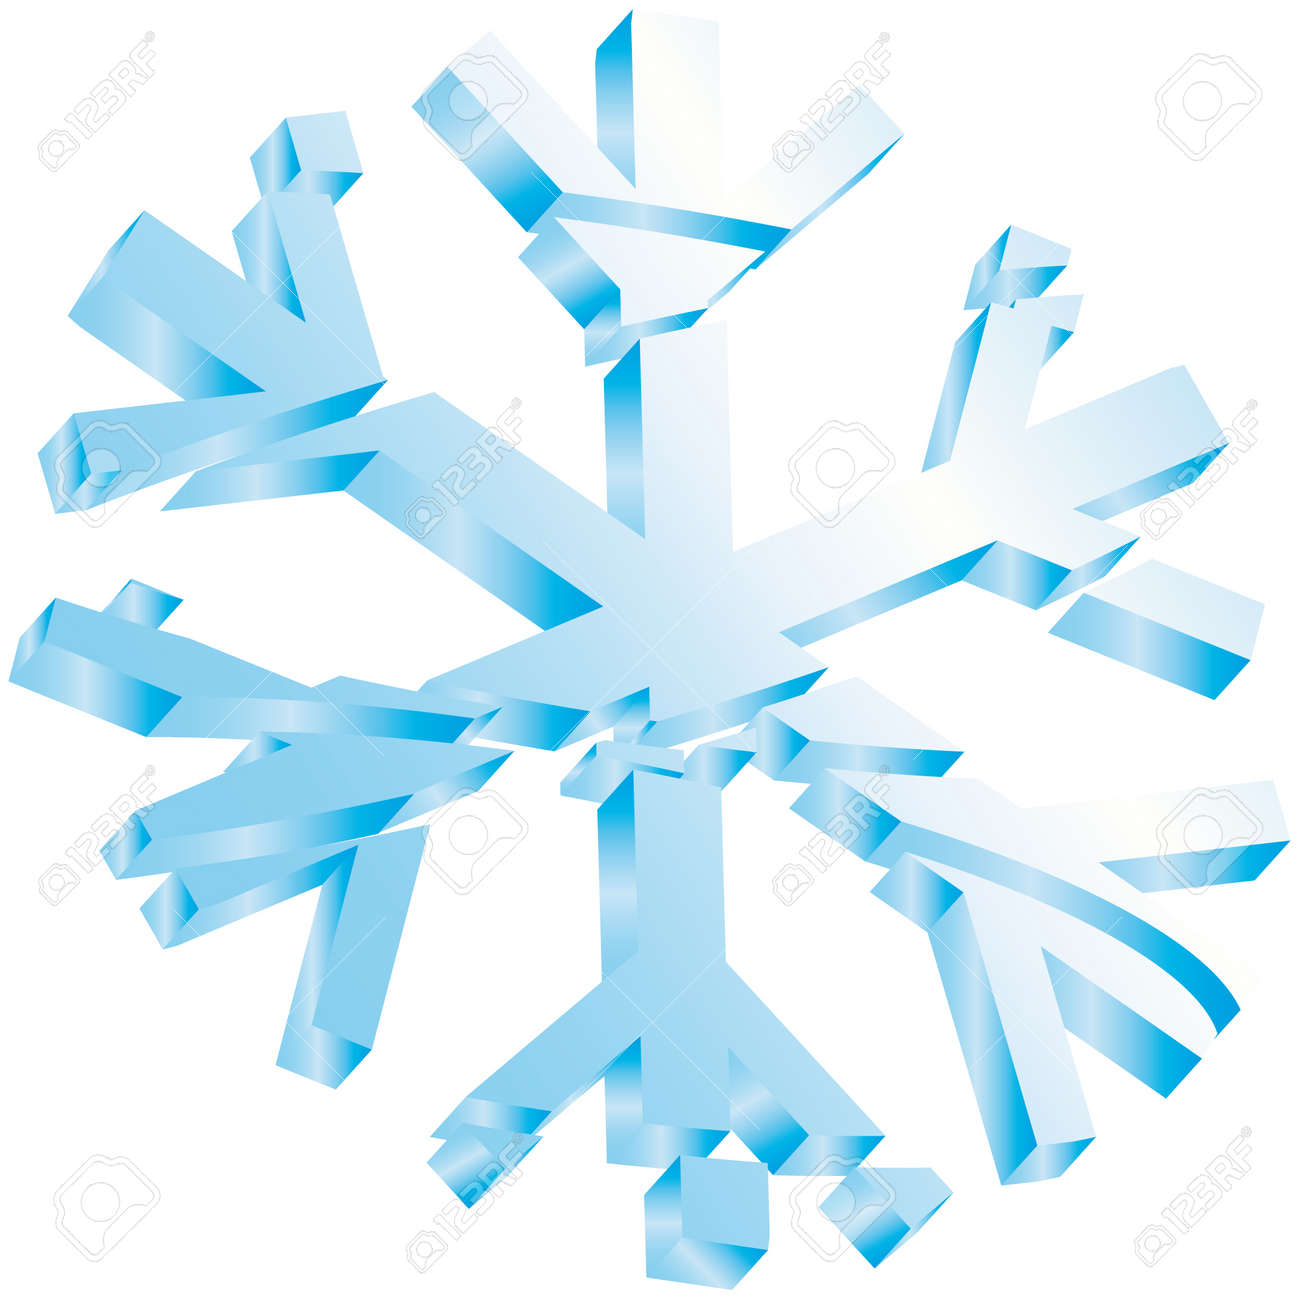 Fabuleux Stelle Di Neve Ghiaccio Natale Clipart Royalty-free, Vettori E  XR66